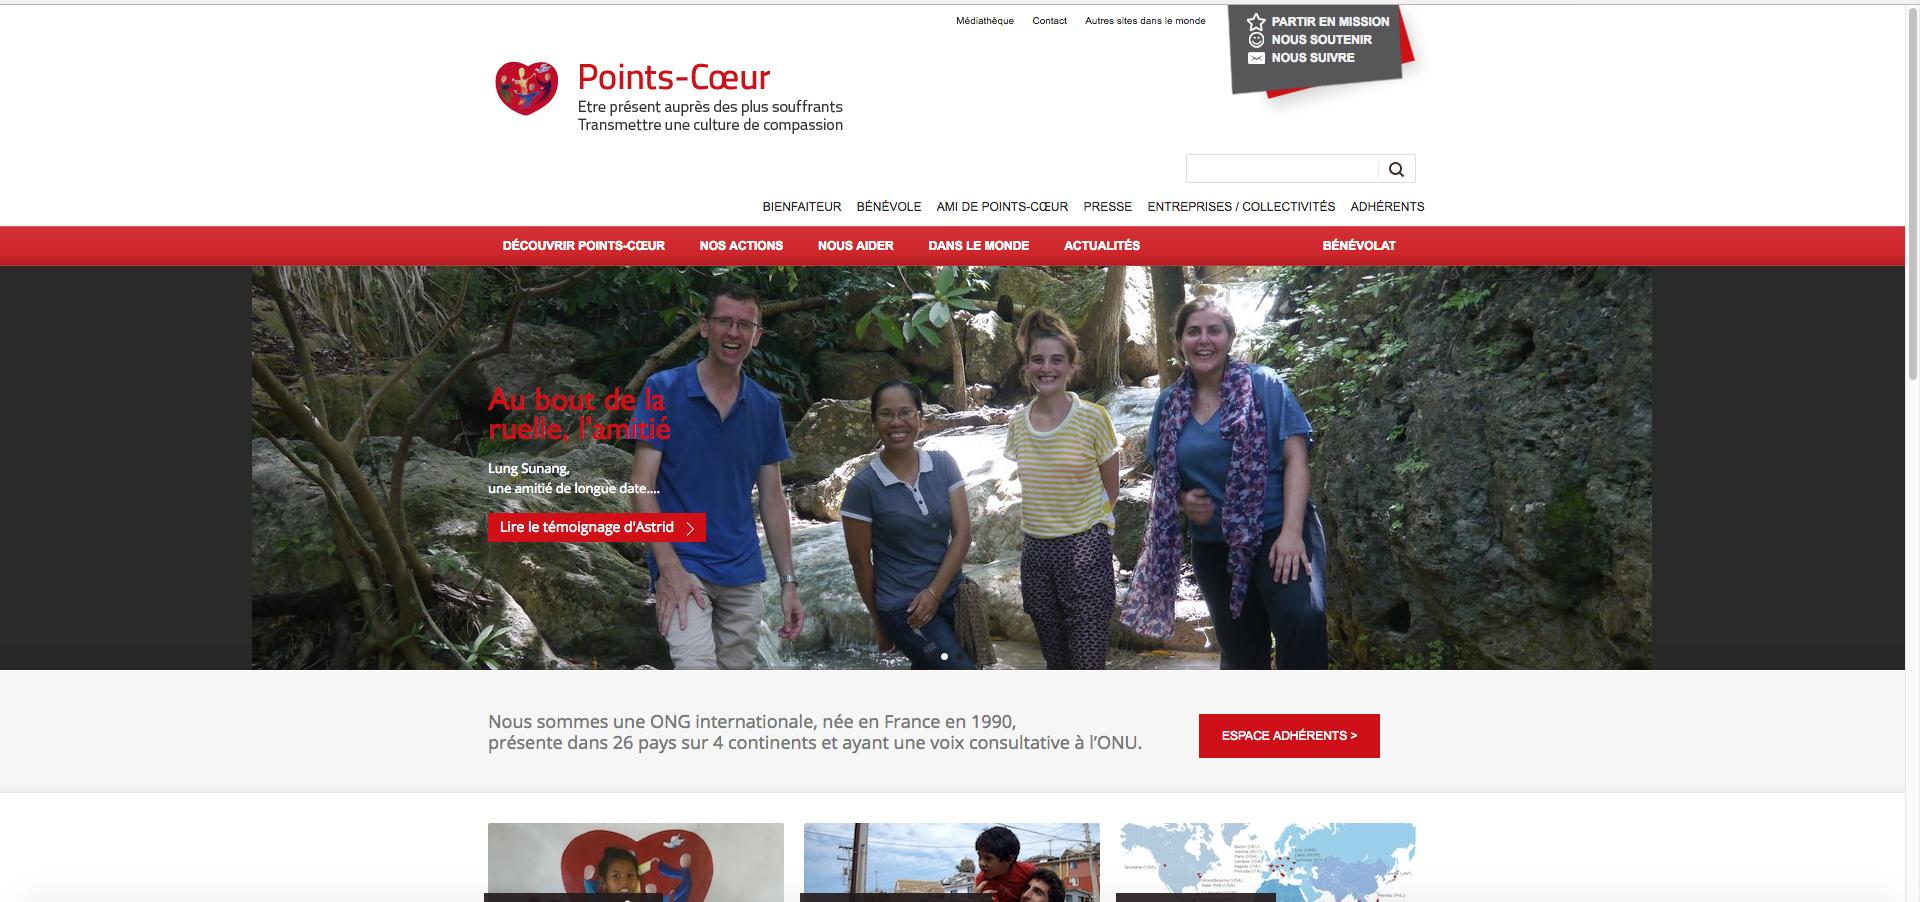 Points-Coeur, capture @ france.pointscoeur.org